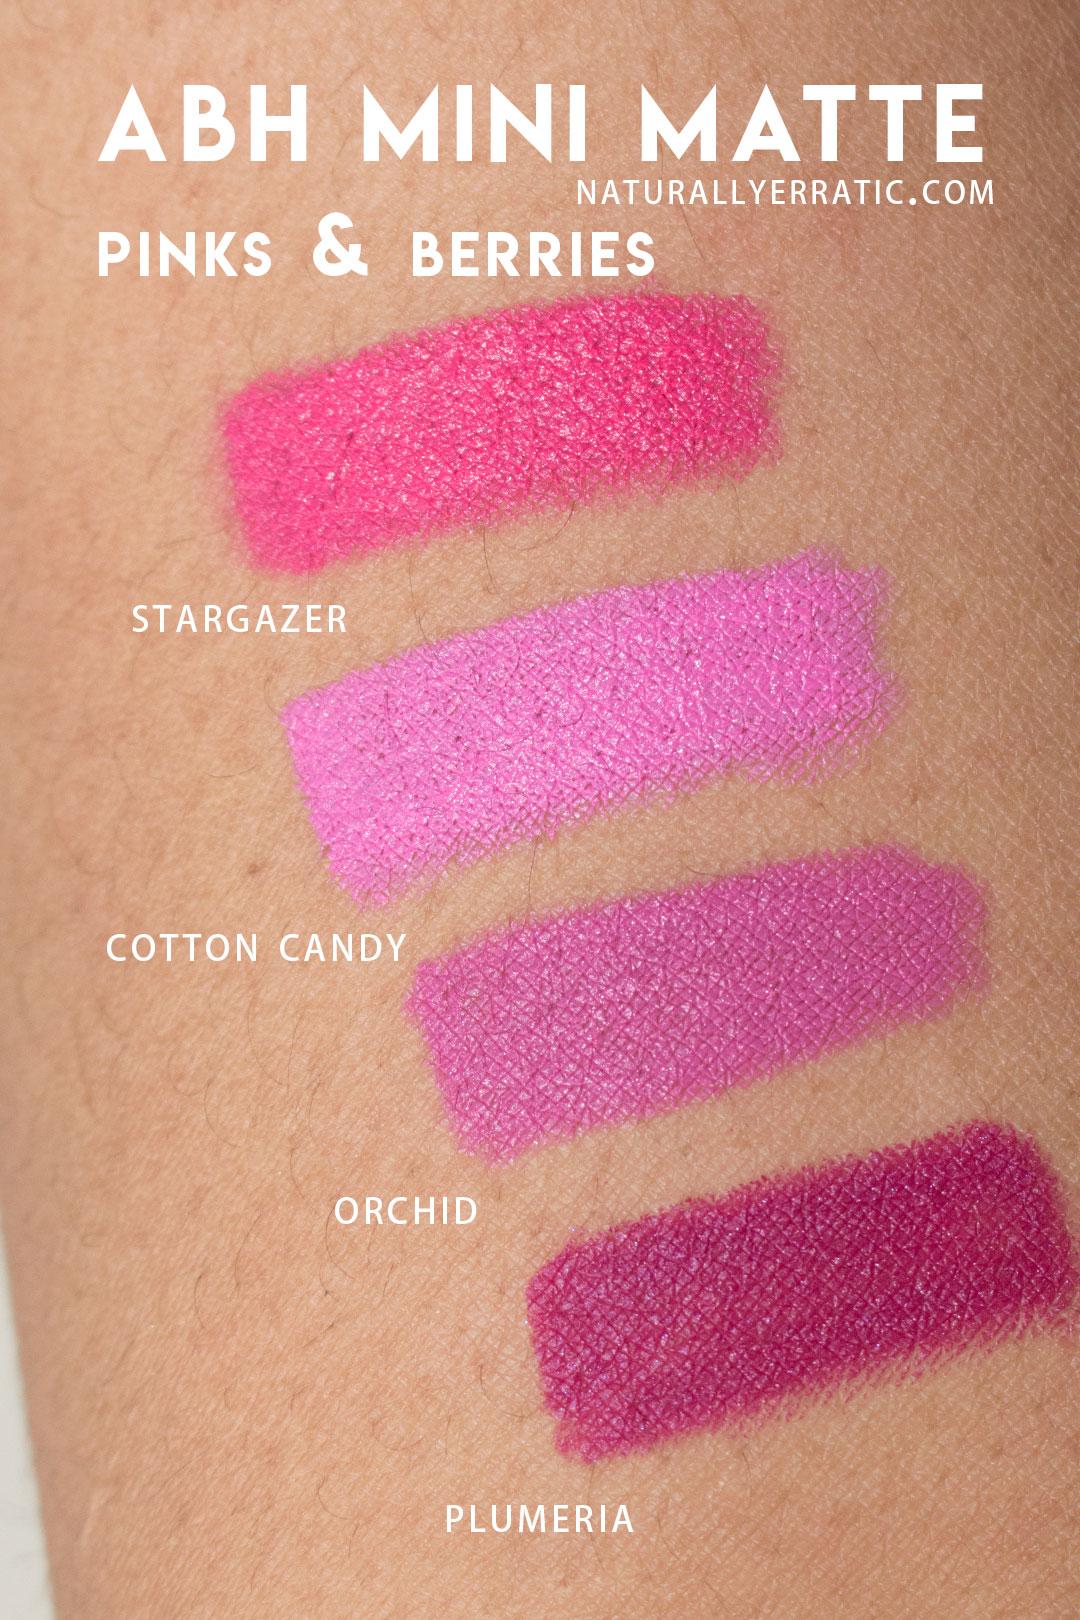 anastasia-beverly-hills-matte-lipstick-pinks-and-berries-swatch.jpg